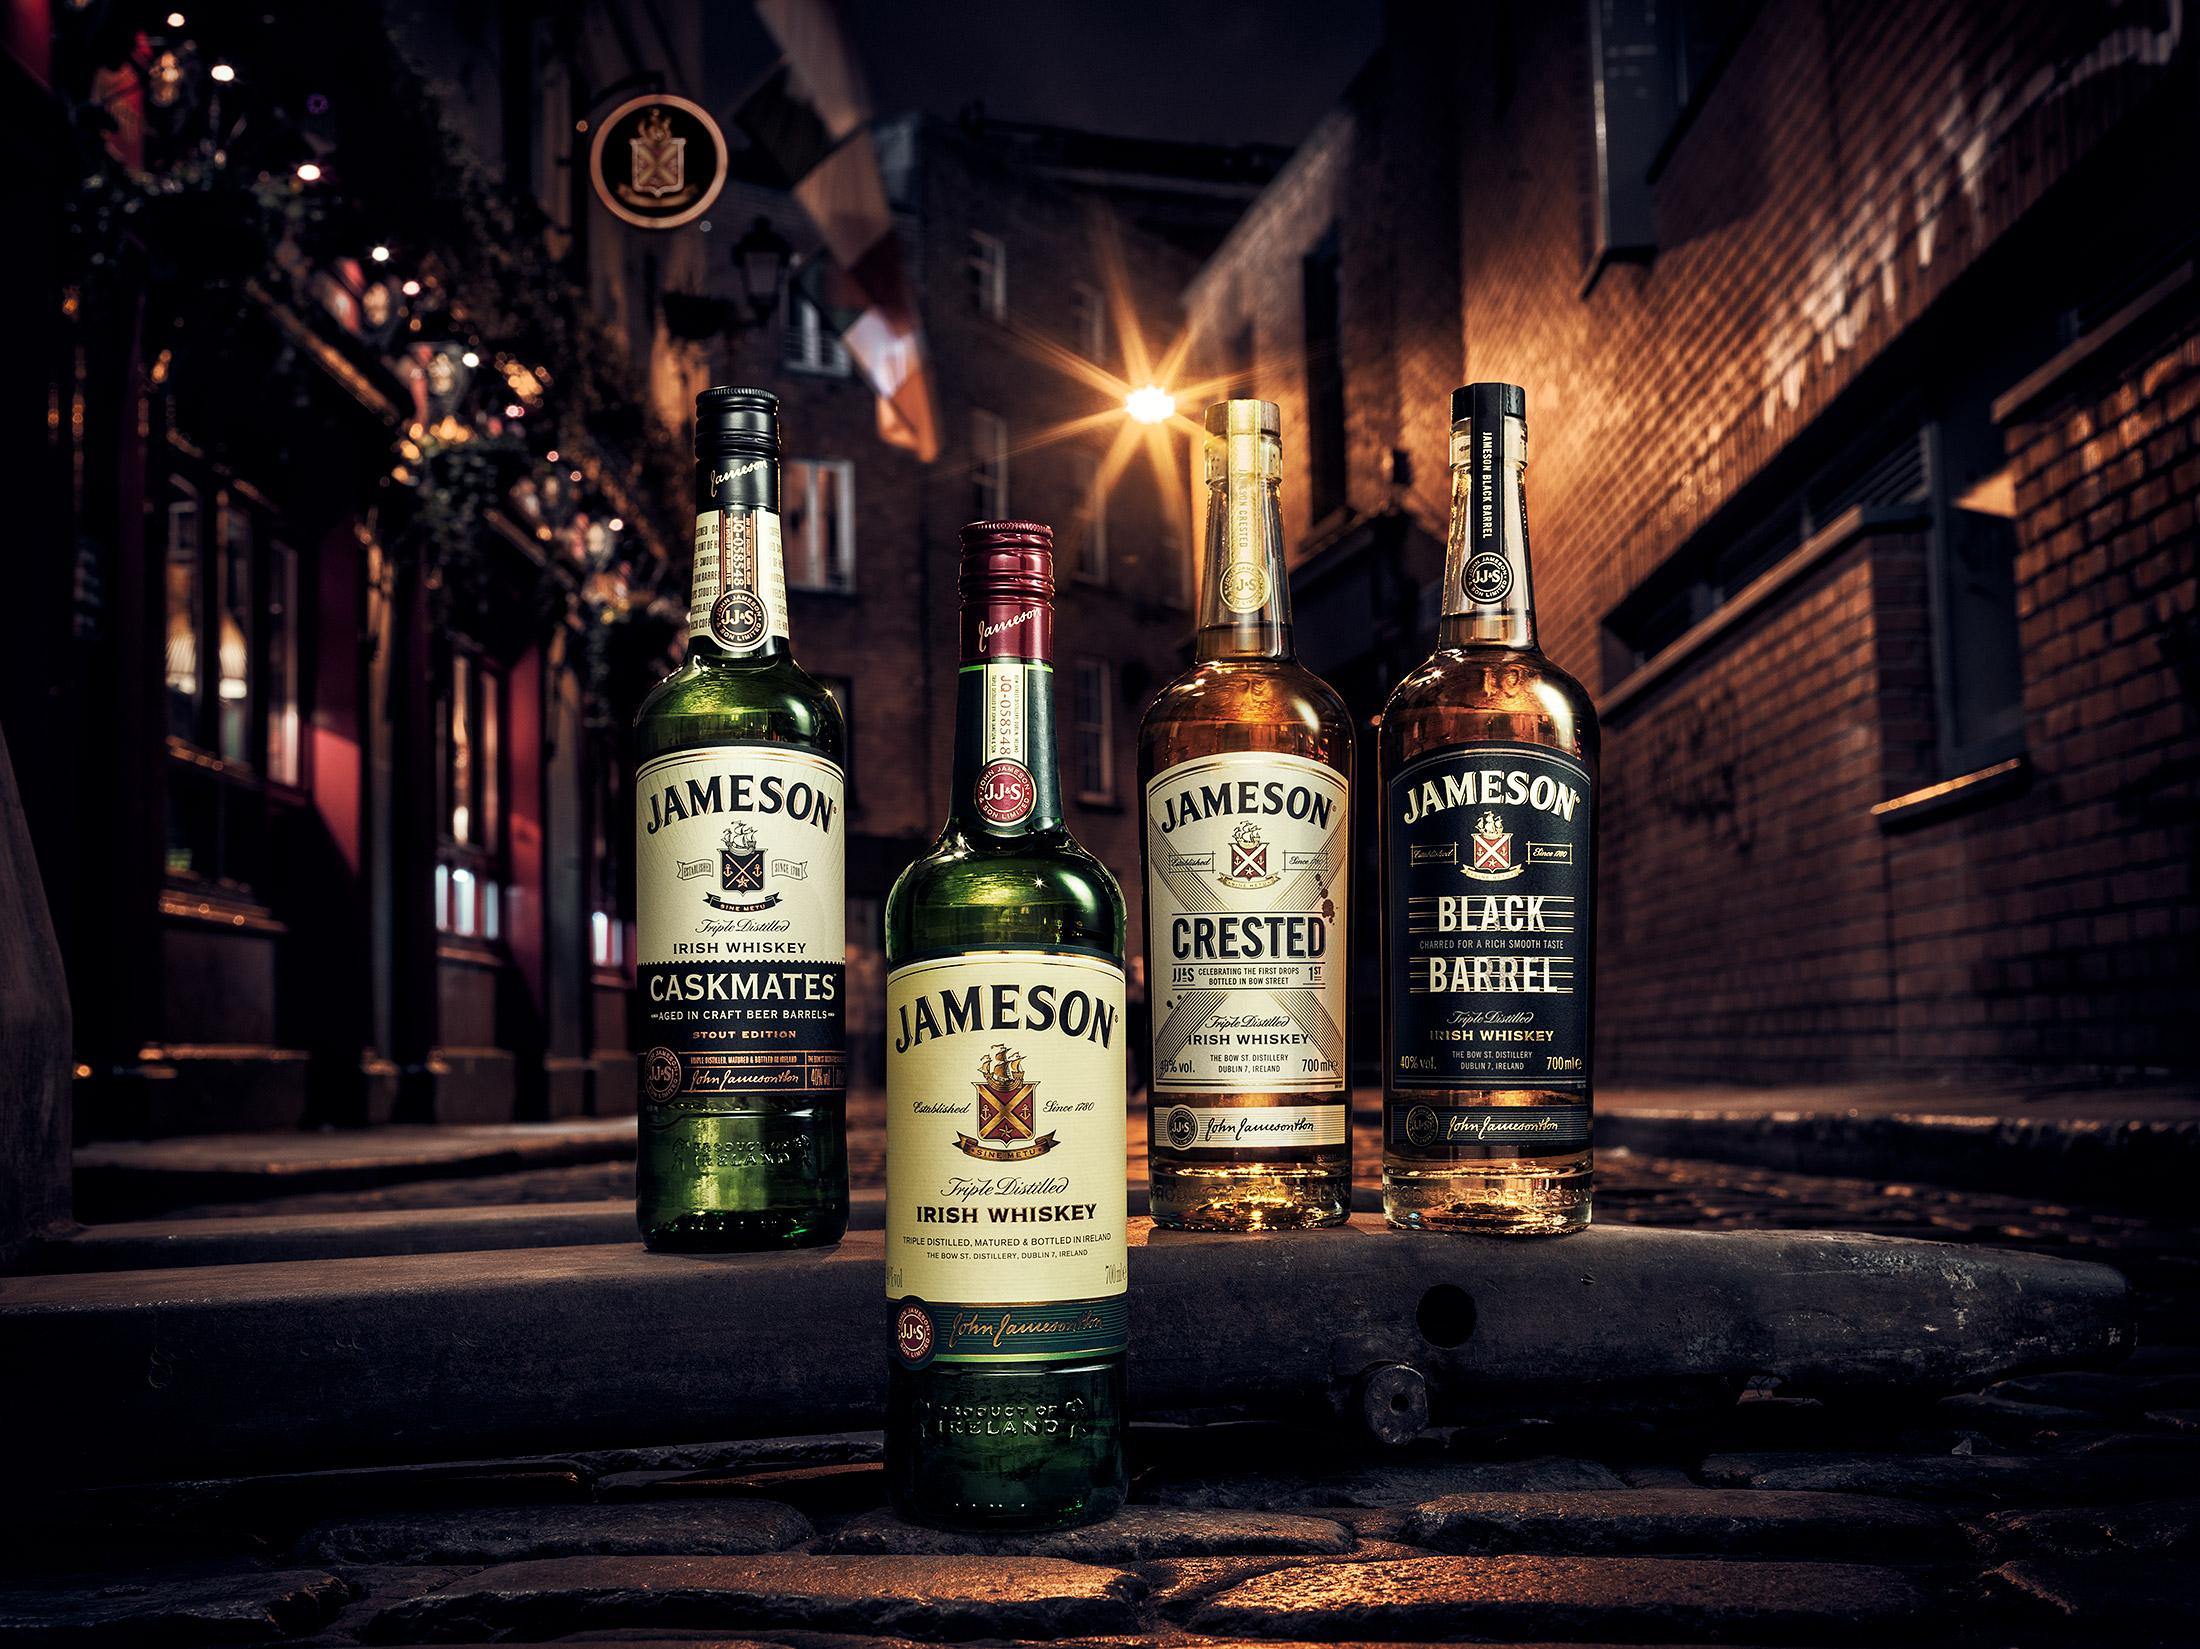 jameson_streets_family1_web.jpg